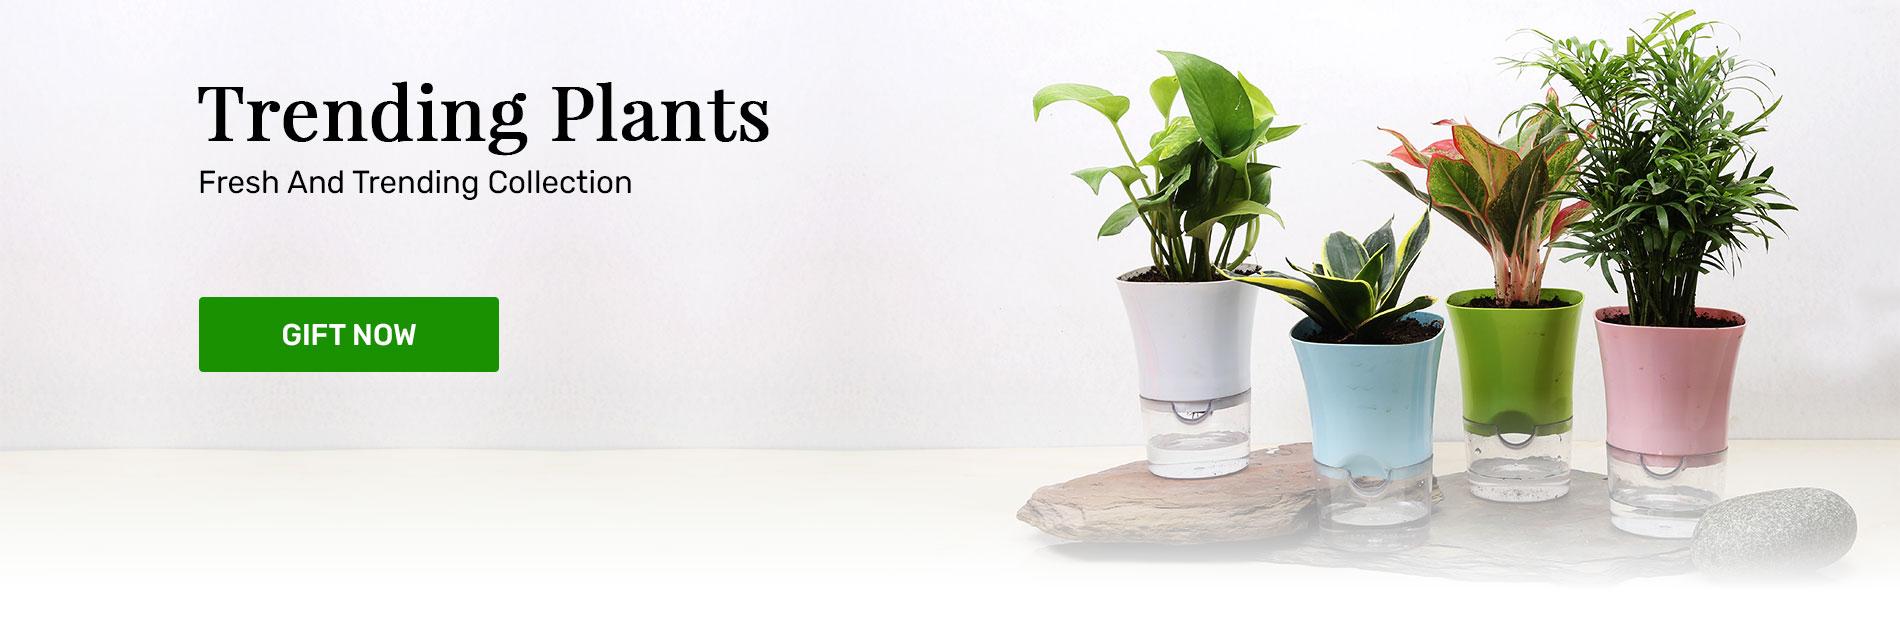 Trending Plants for Gifting